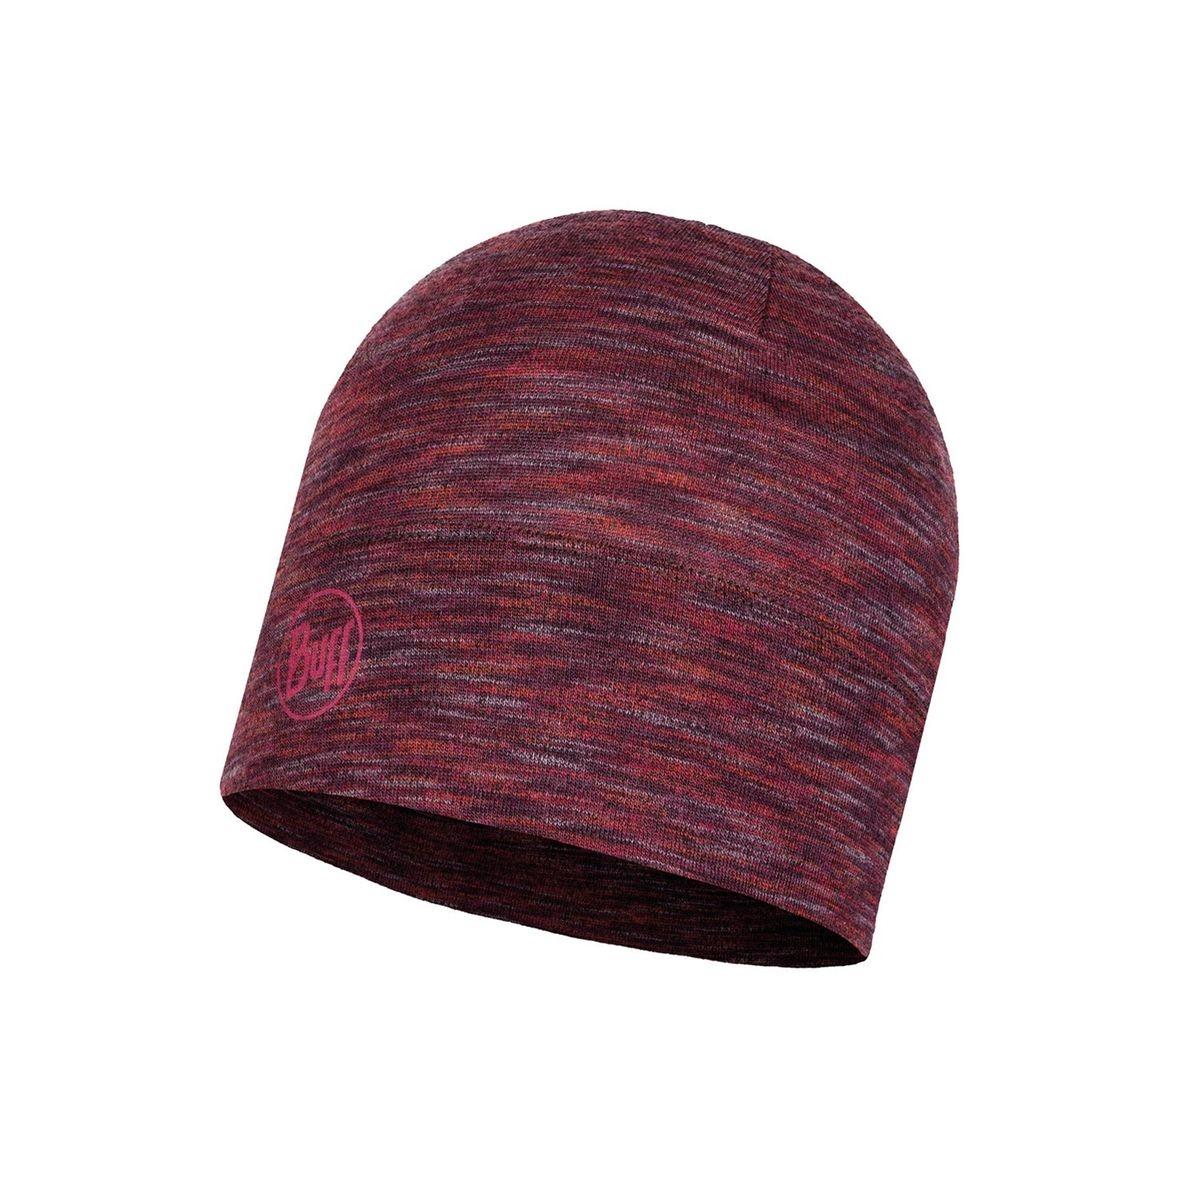 Bonnet laine mérinos MIDWEIGHT